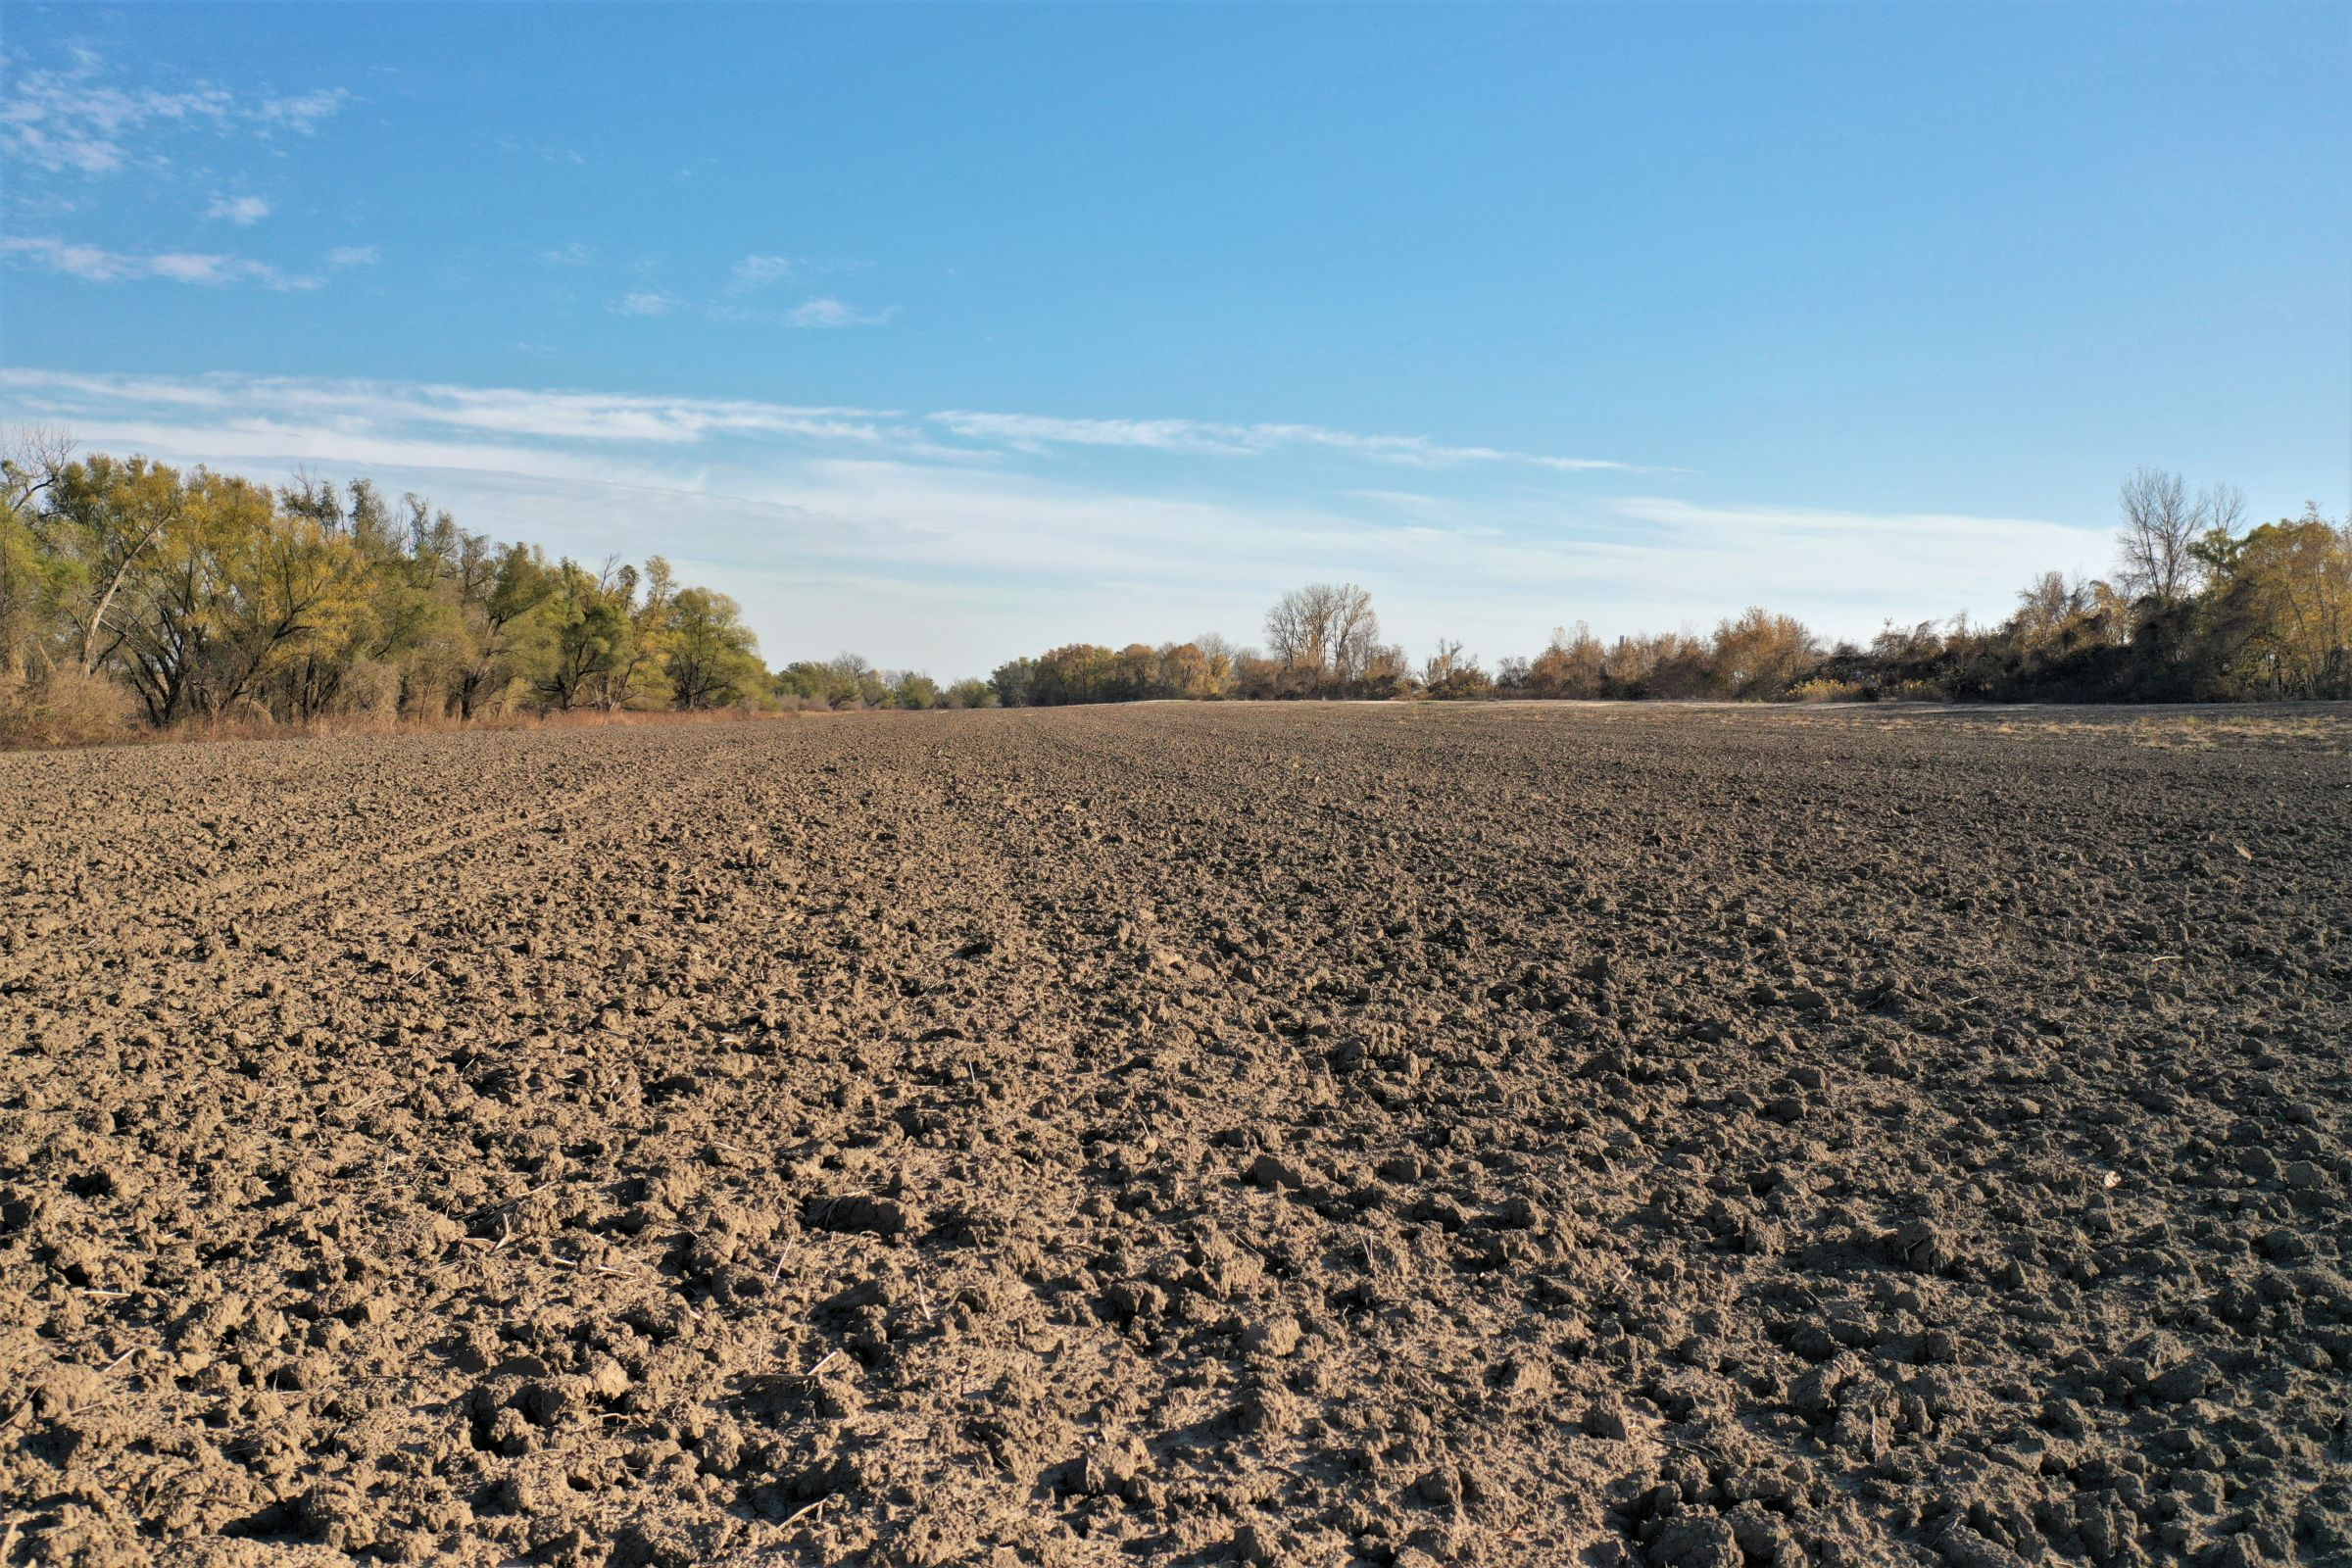 land-monroe-county-illinois-62-acres-listing-number-15265-1-2020-11-20-193043.jpg